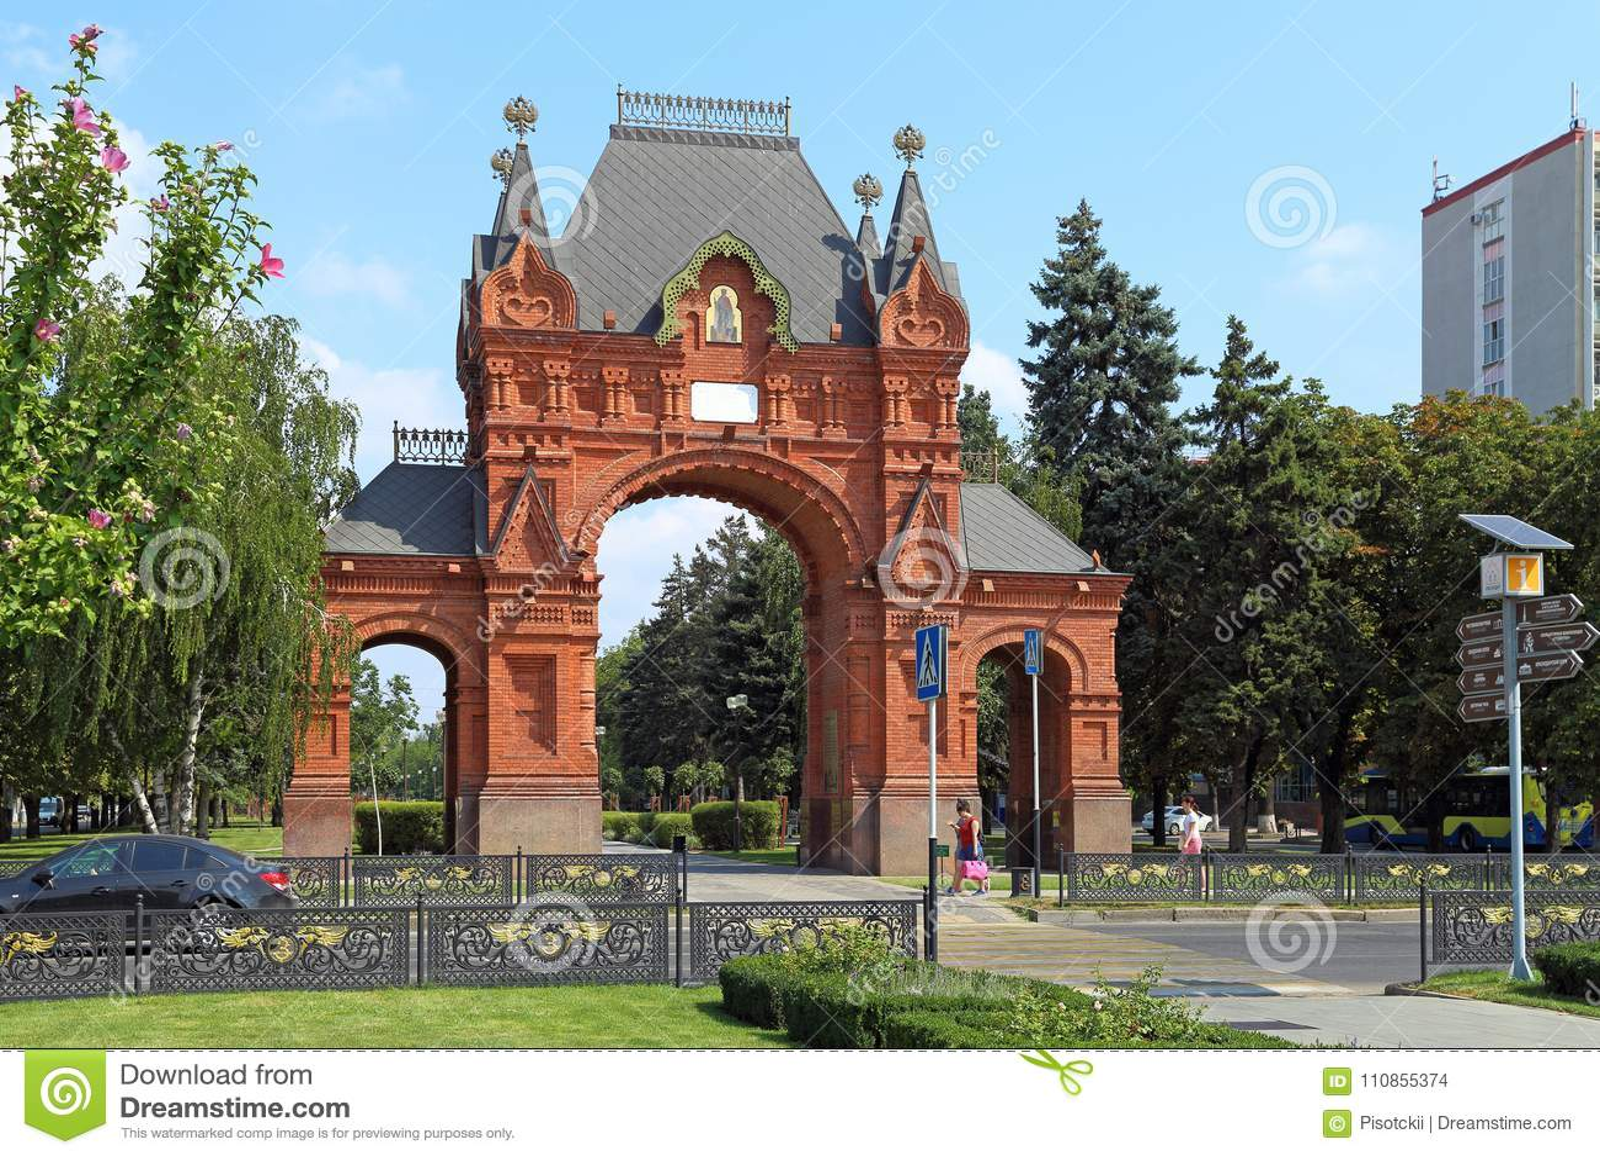 Alexander Triumphal Arch In Sunny Weather In The City Of Krasnodar Editorial Stock Image Image Of Brick Landmark 110855374